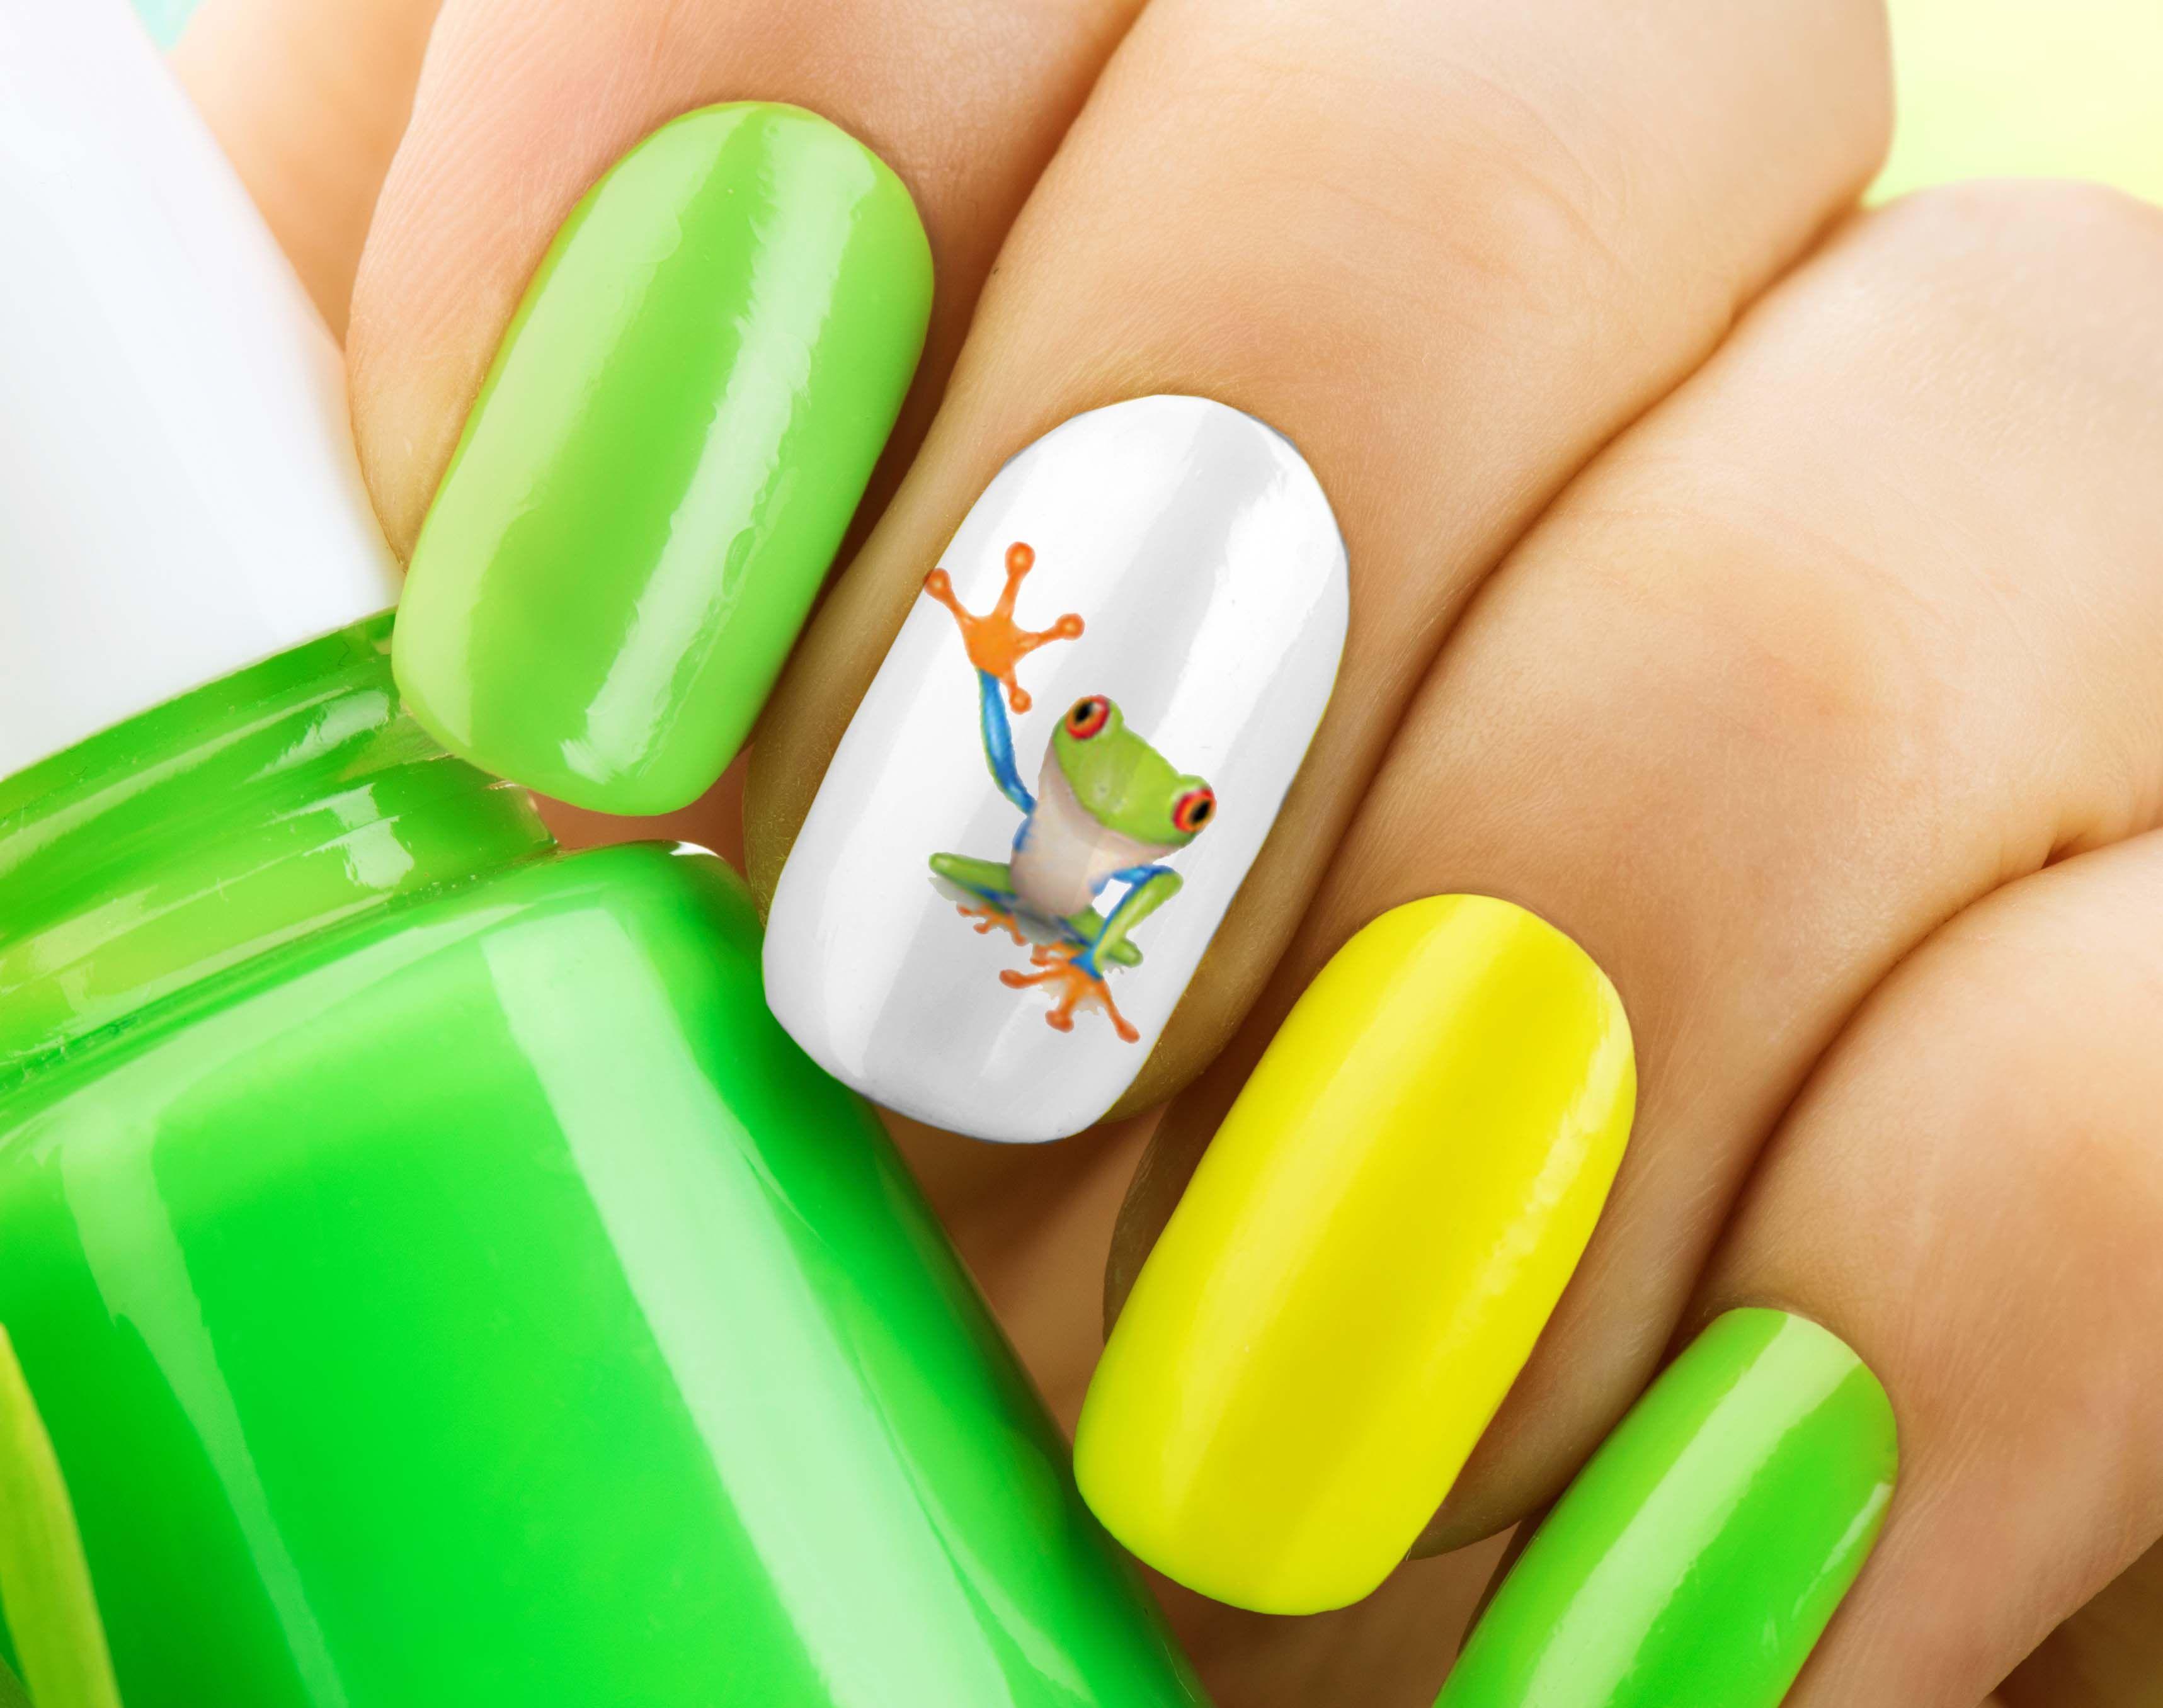 Pin de Moon Sugar Decals en Frogs Nail Art Decals | Pinterest